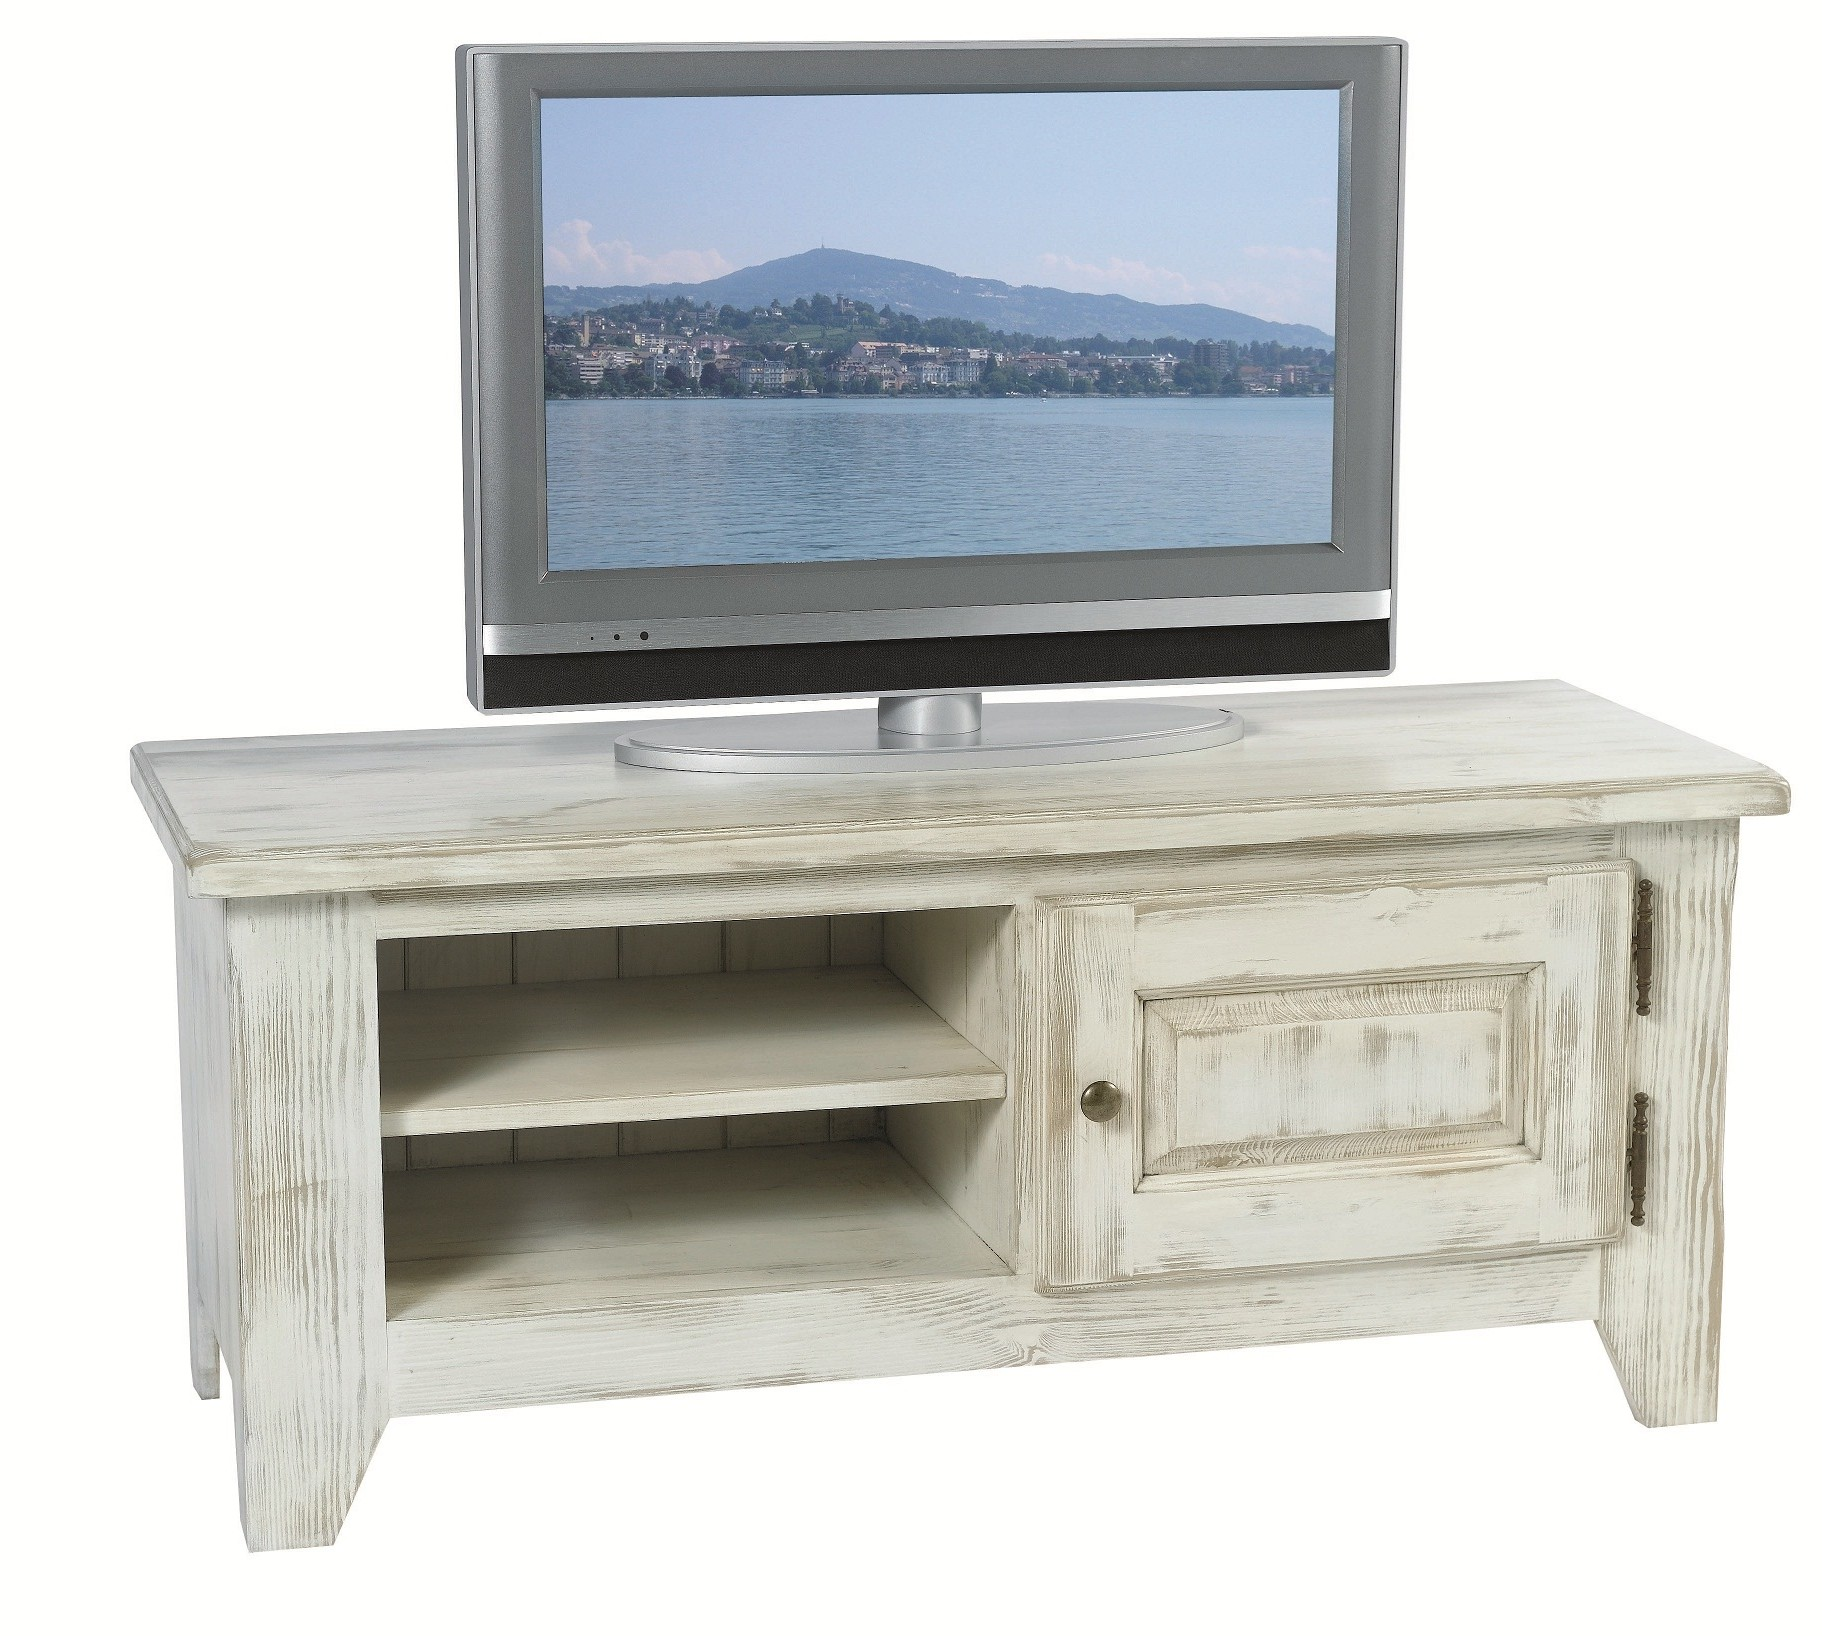 meuble tv pin ceruse blanchi 1 porte 2 niches 116x43x50cm rivage